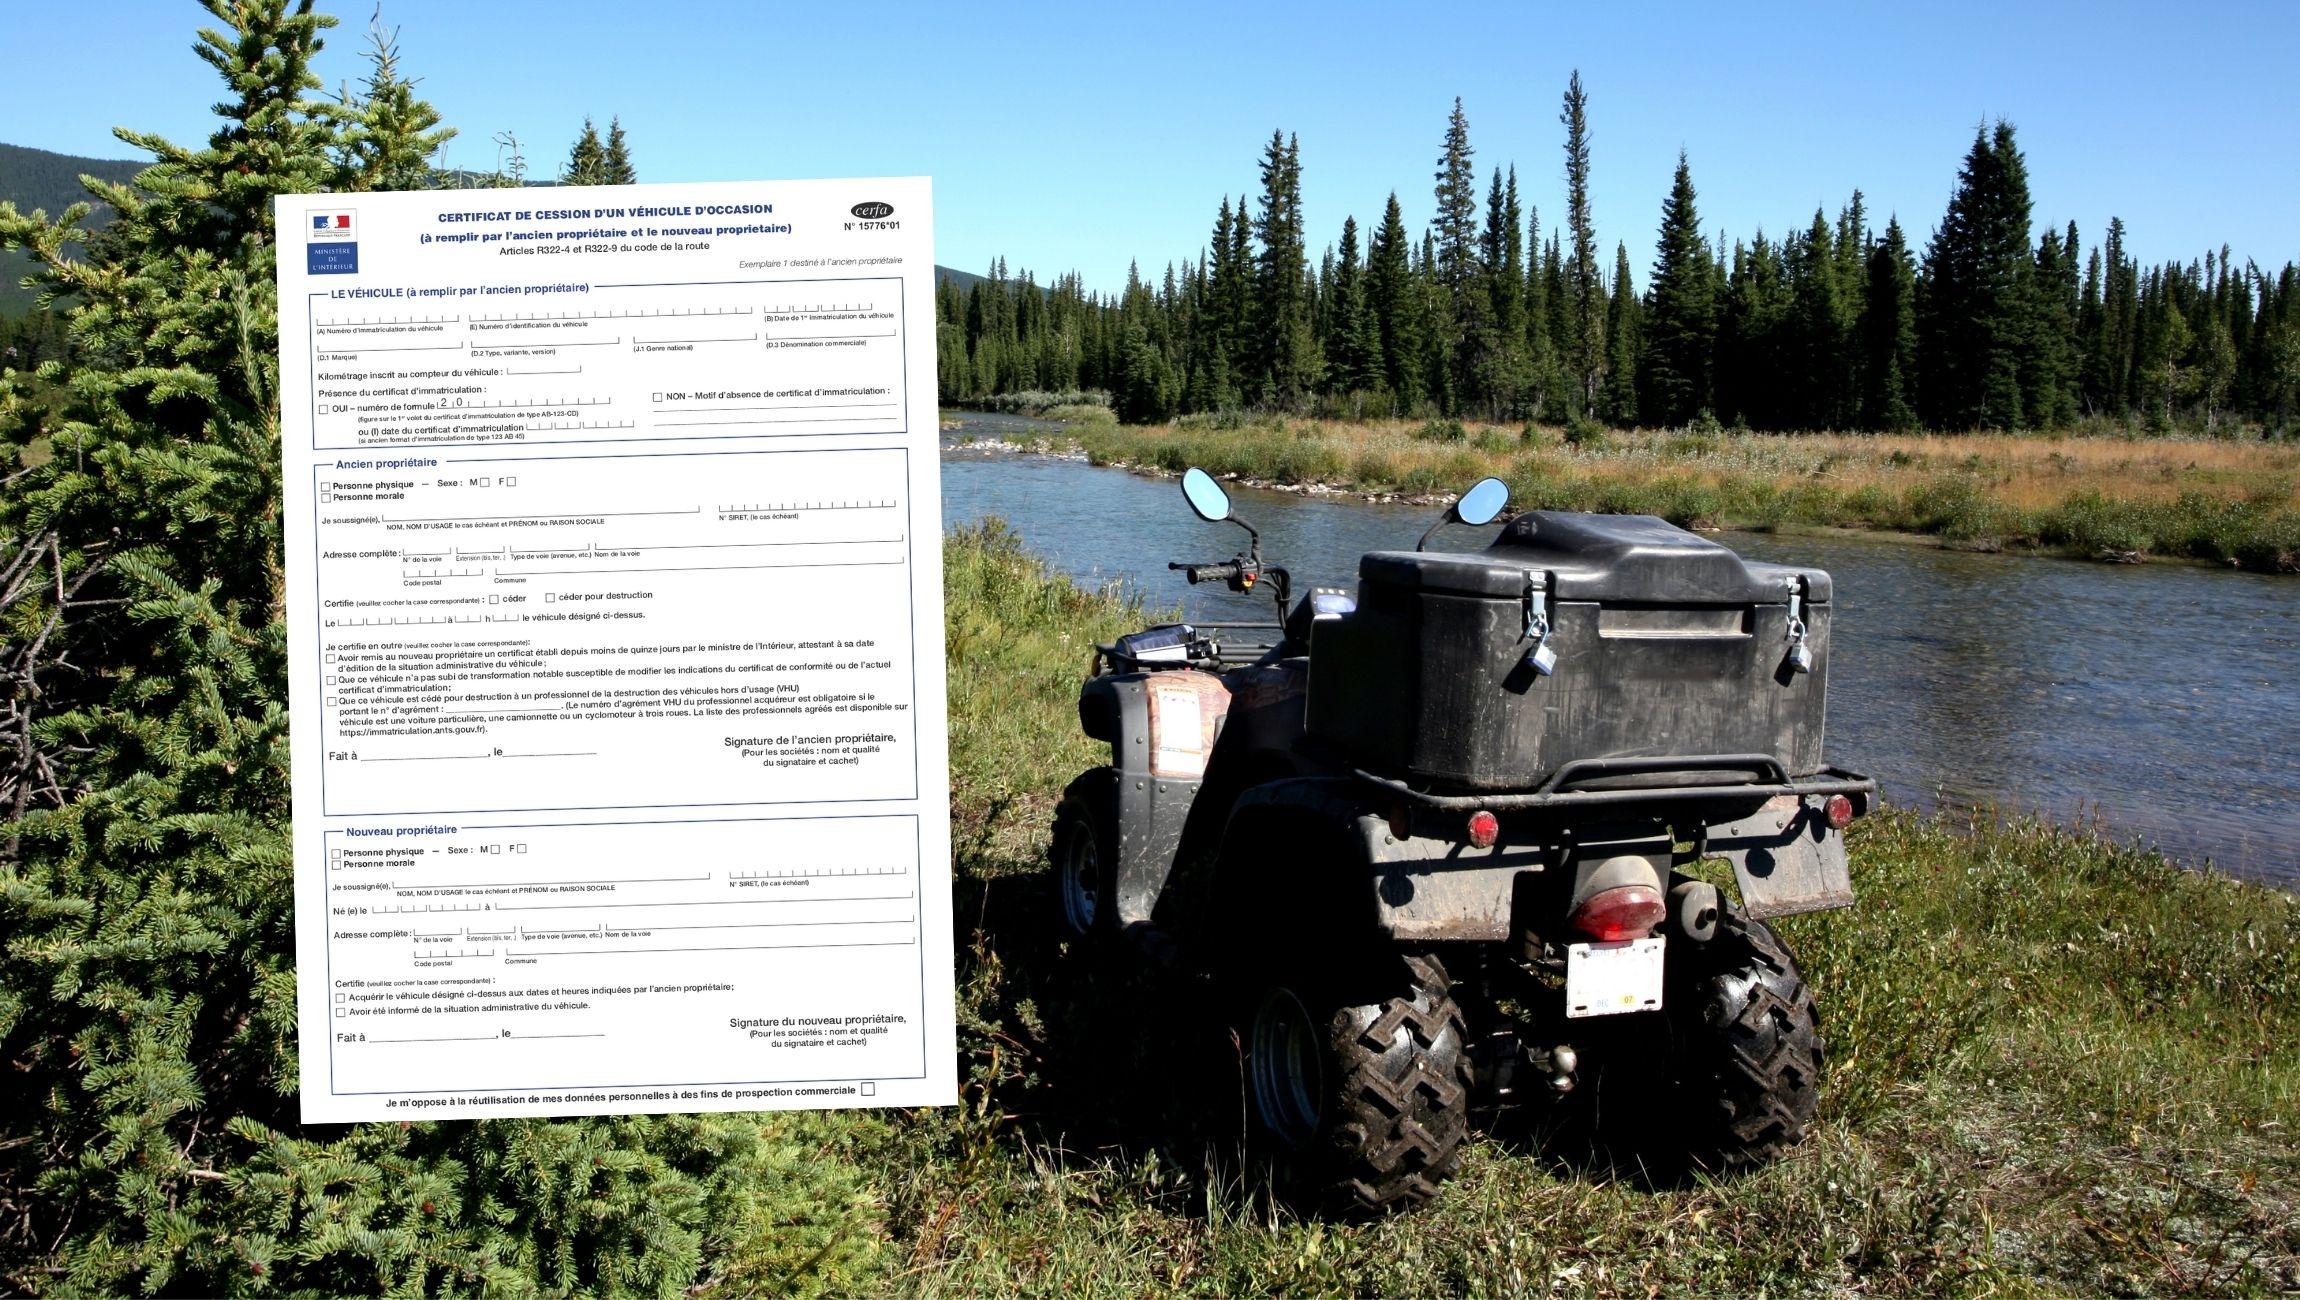 Certificat de cession quad / quad homologue